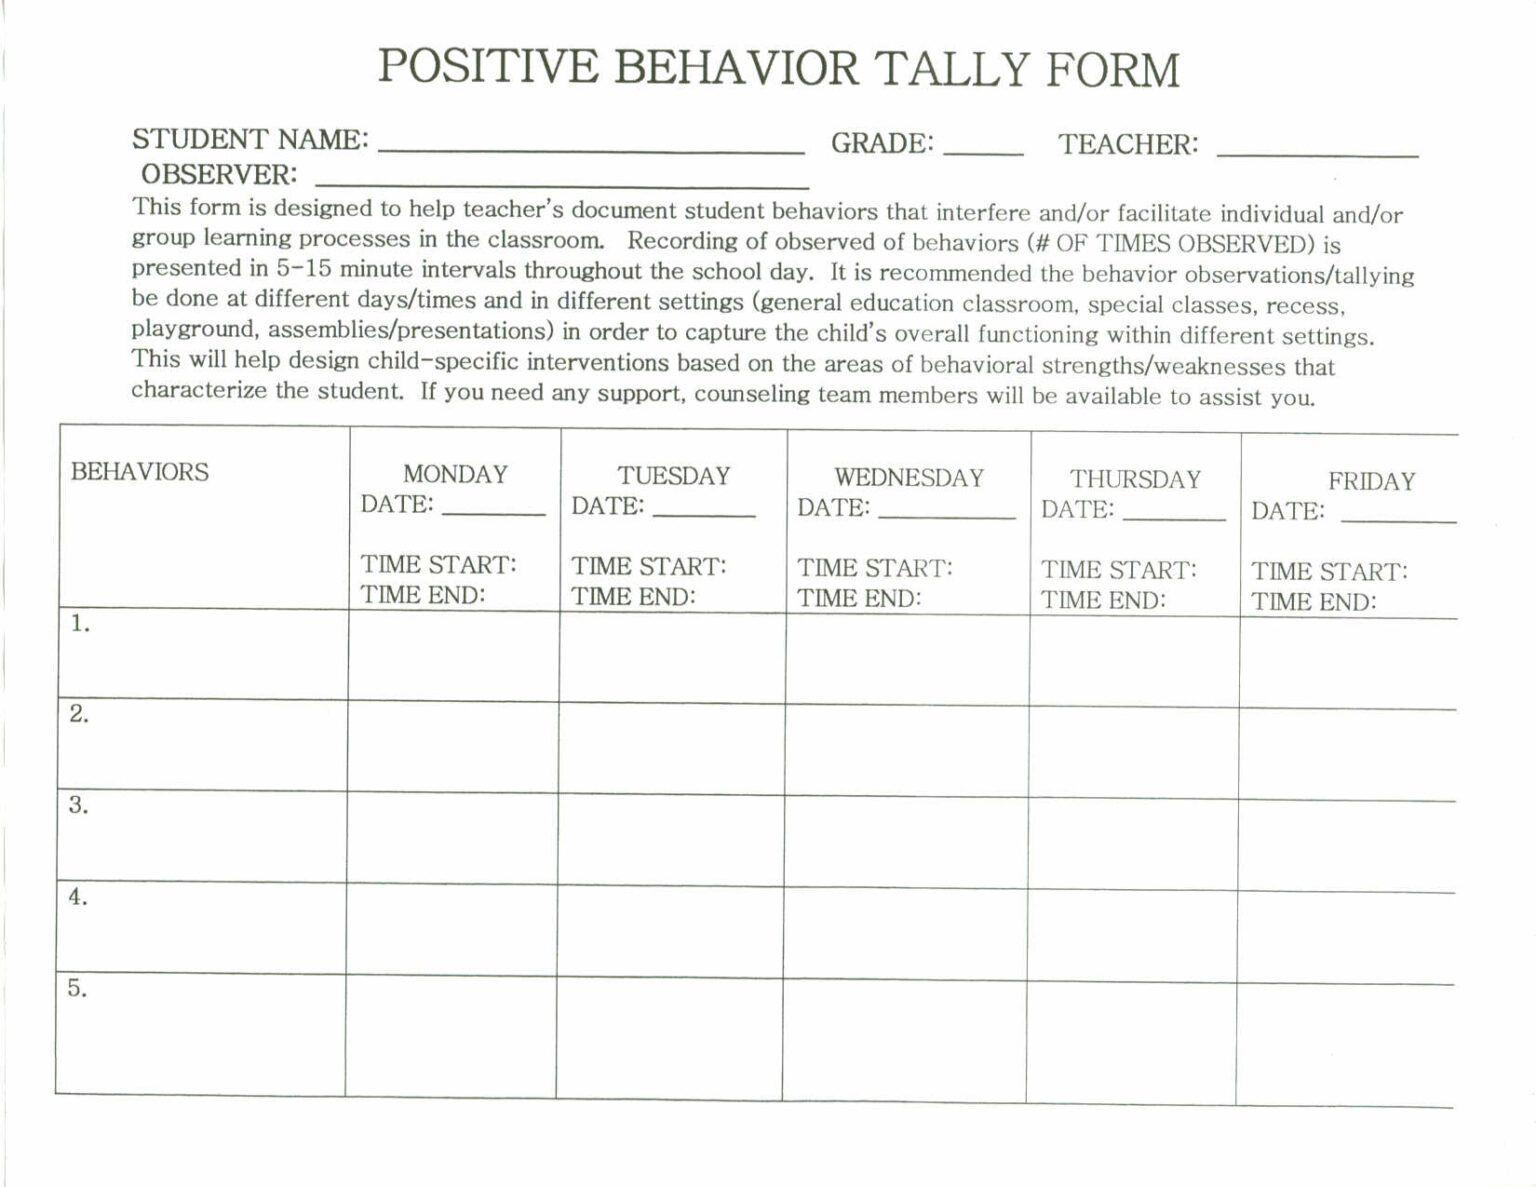 Blank Frequency Graph Worksheet Printable Worksheets And Regarding Blank Stem And Leaf Plot Template Printable Worksheets Templates Graphing